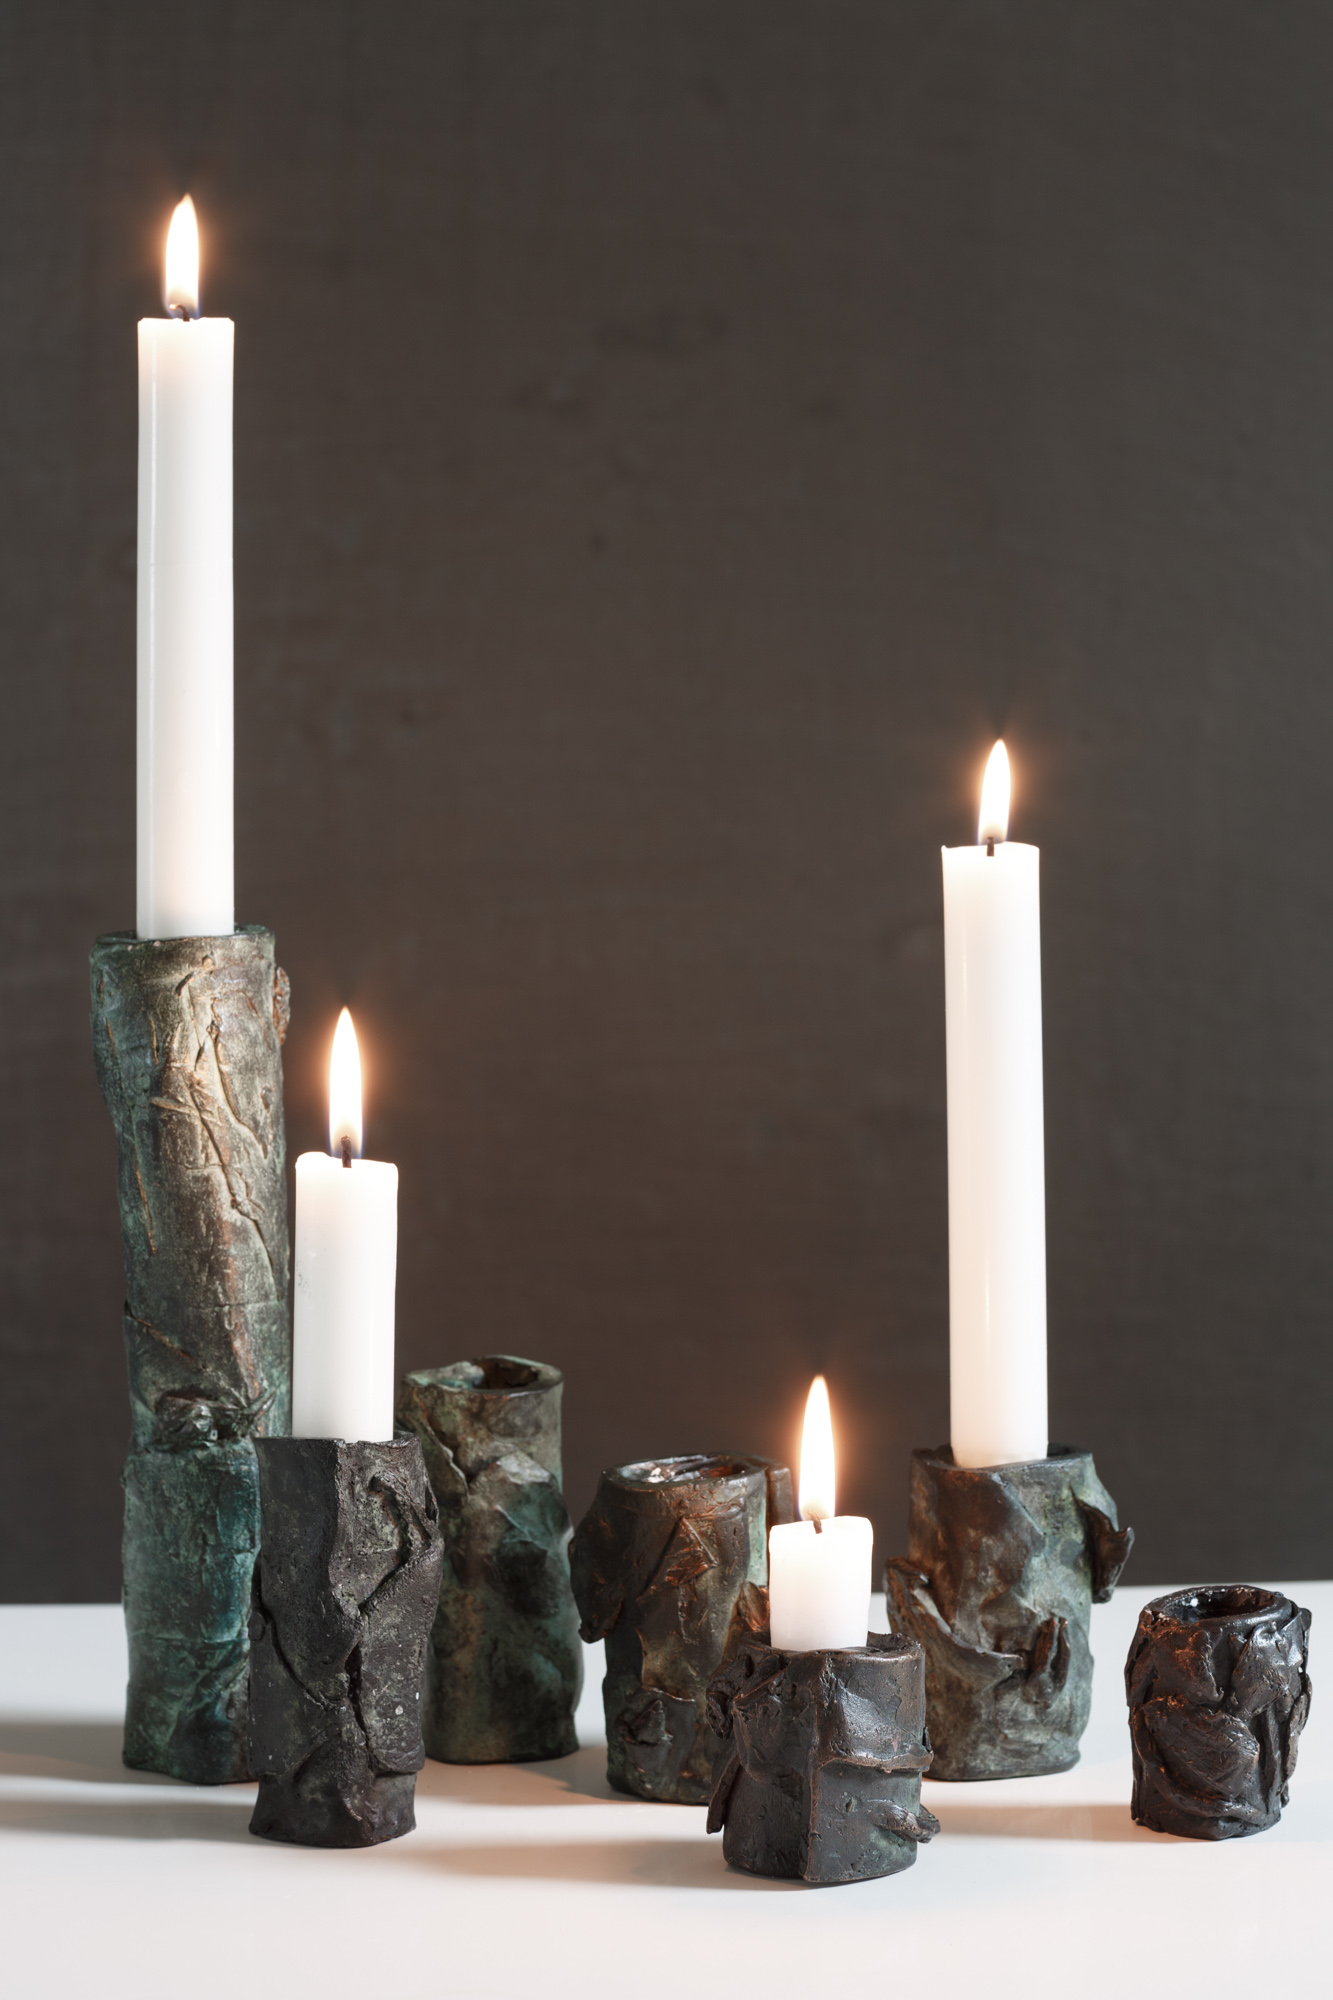 B&D Design Candlesticks-16-LowRes.jpg